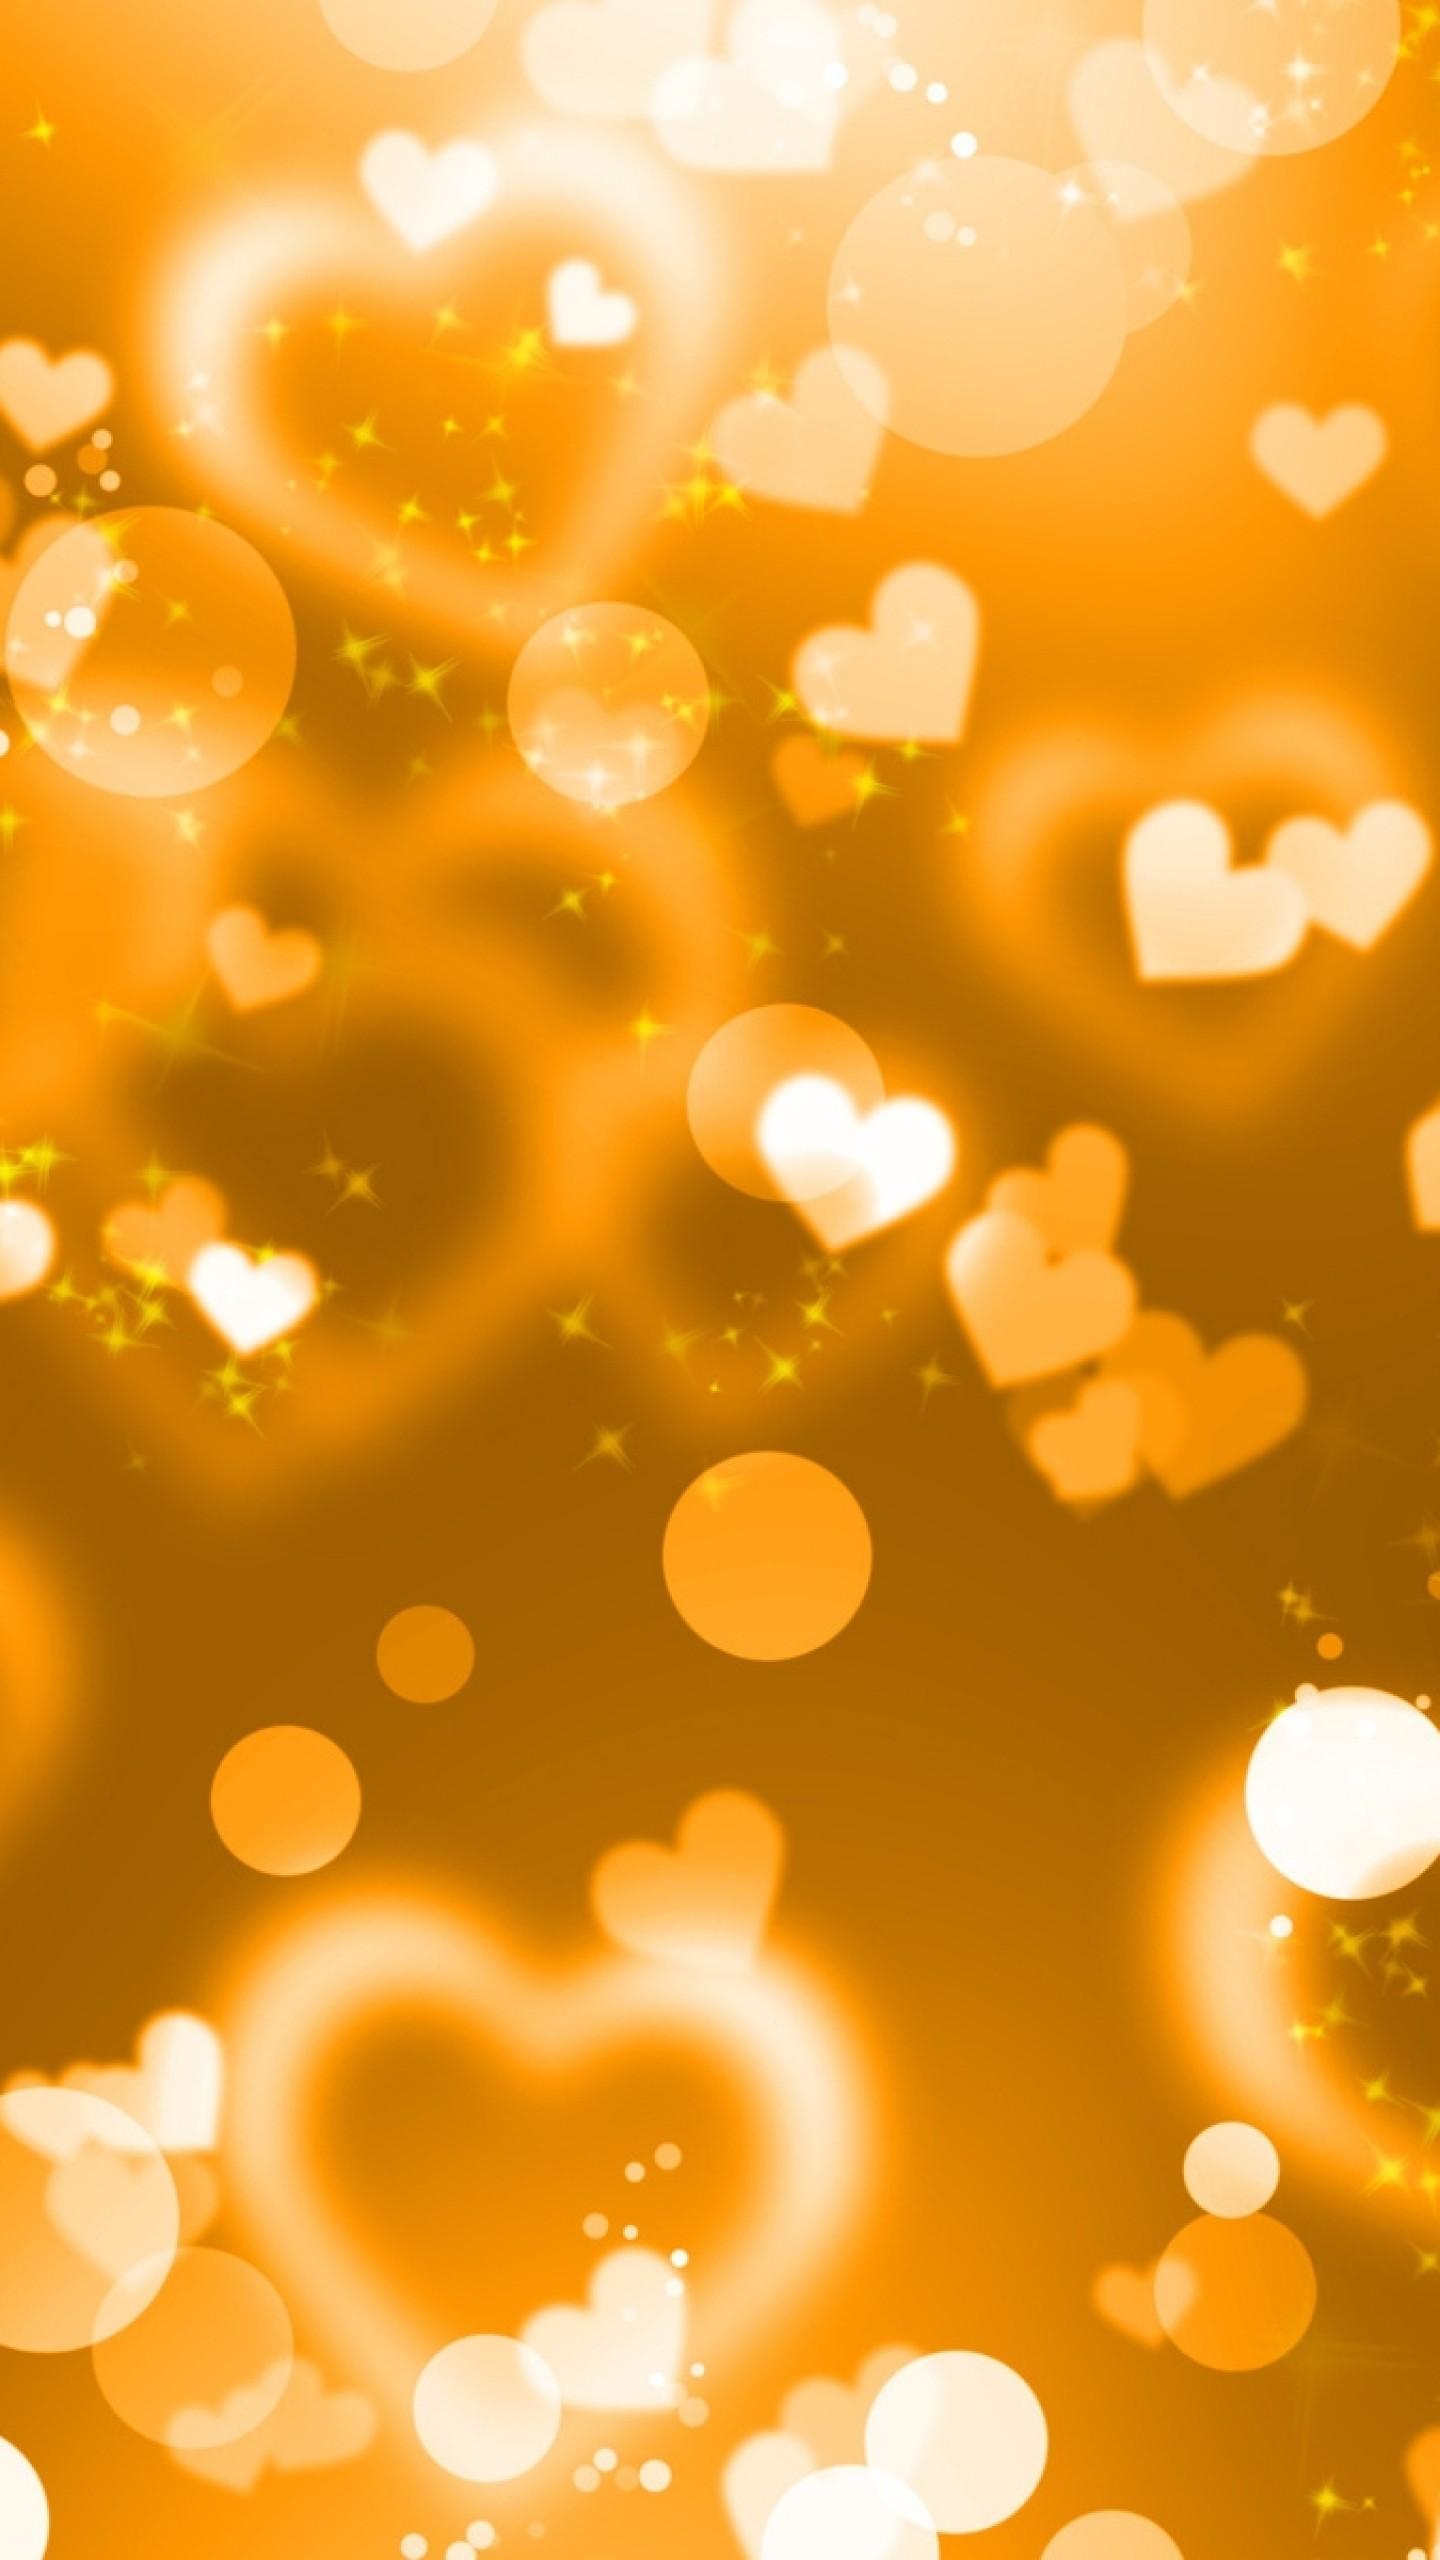 Wallpaper glare, hearts, lights, glitter, gold